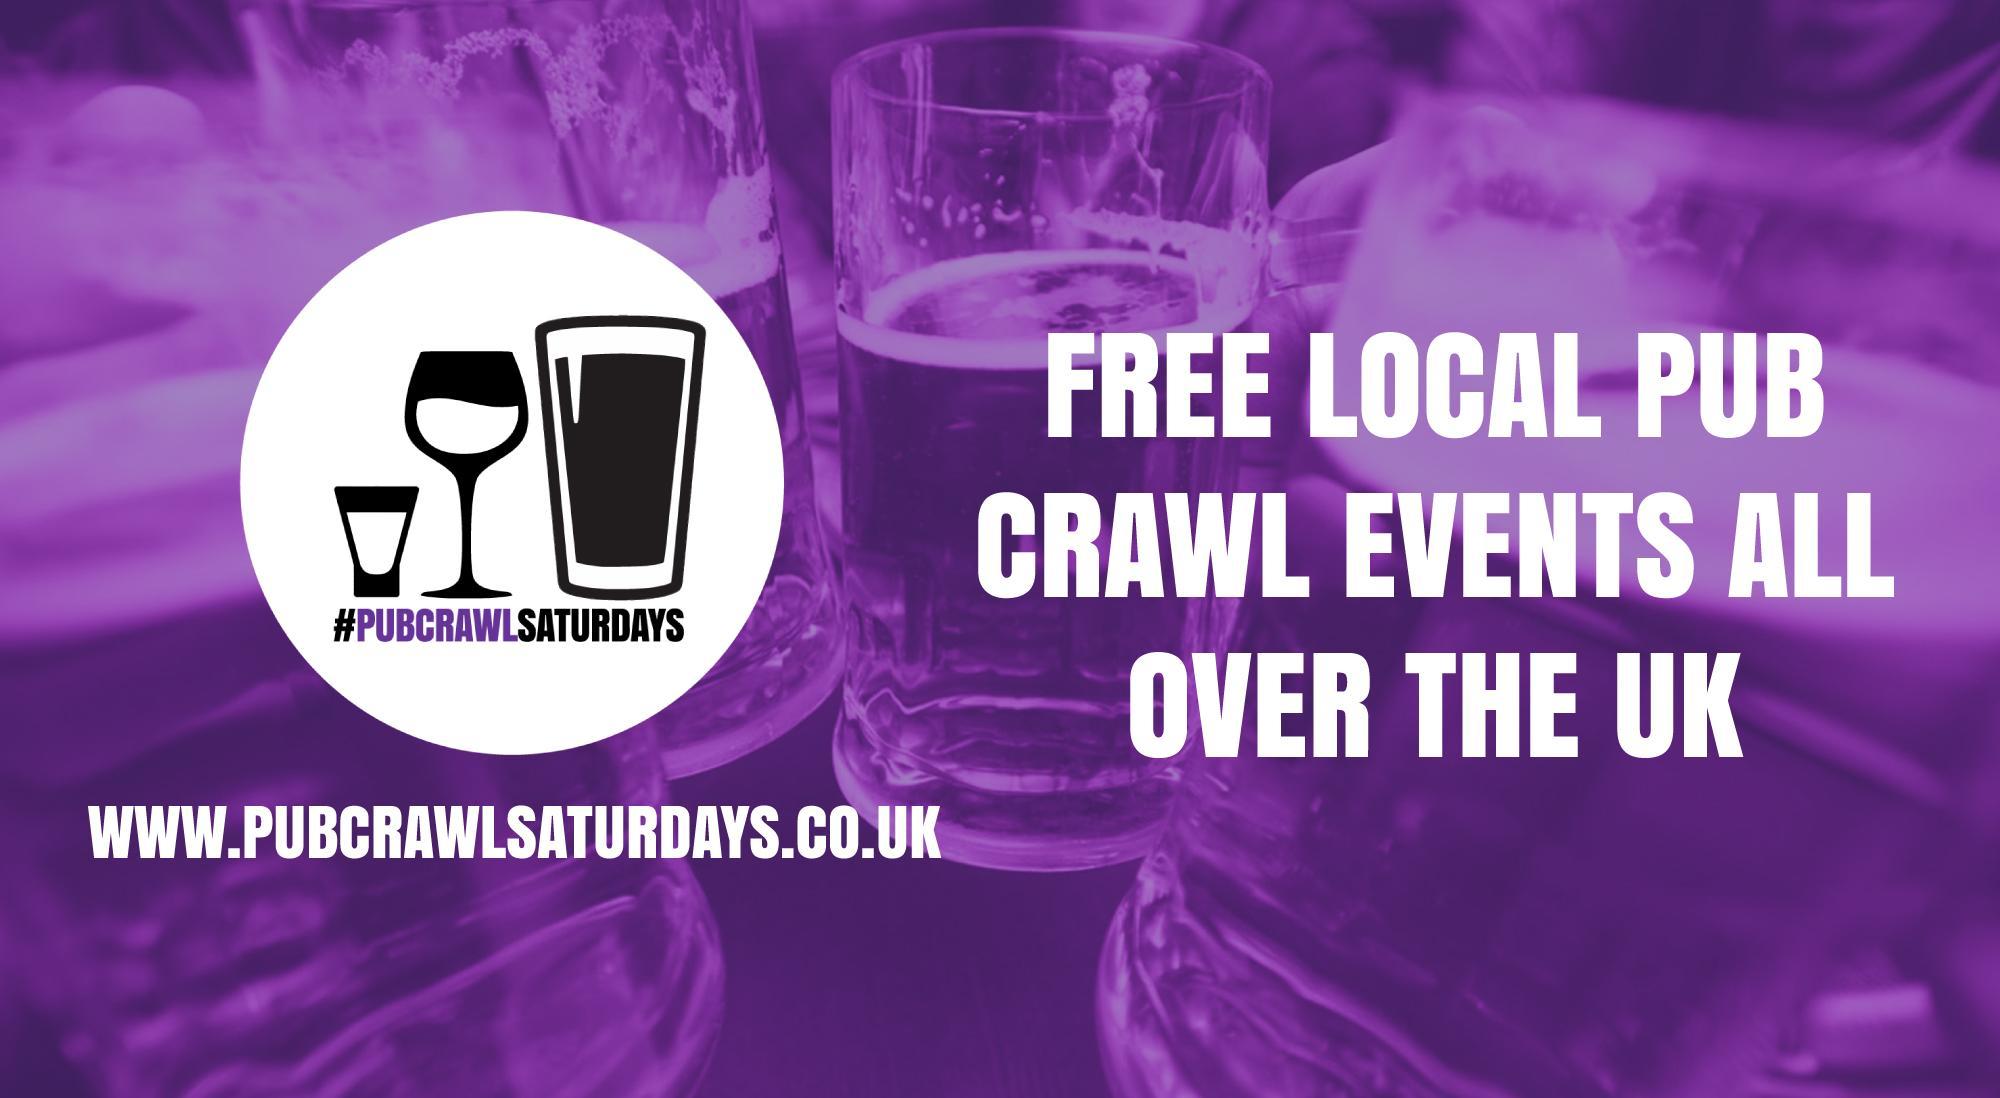 PUB CRAWL SATURDAYS! Free weekly pub crawl event in Doncaster